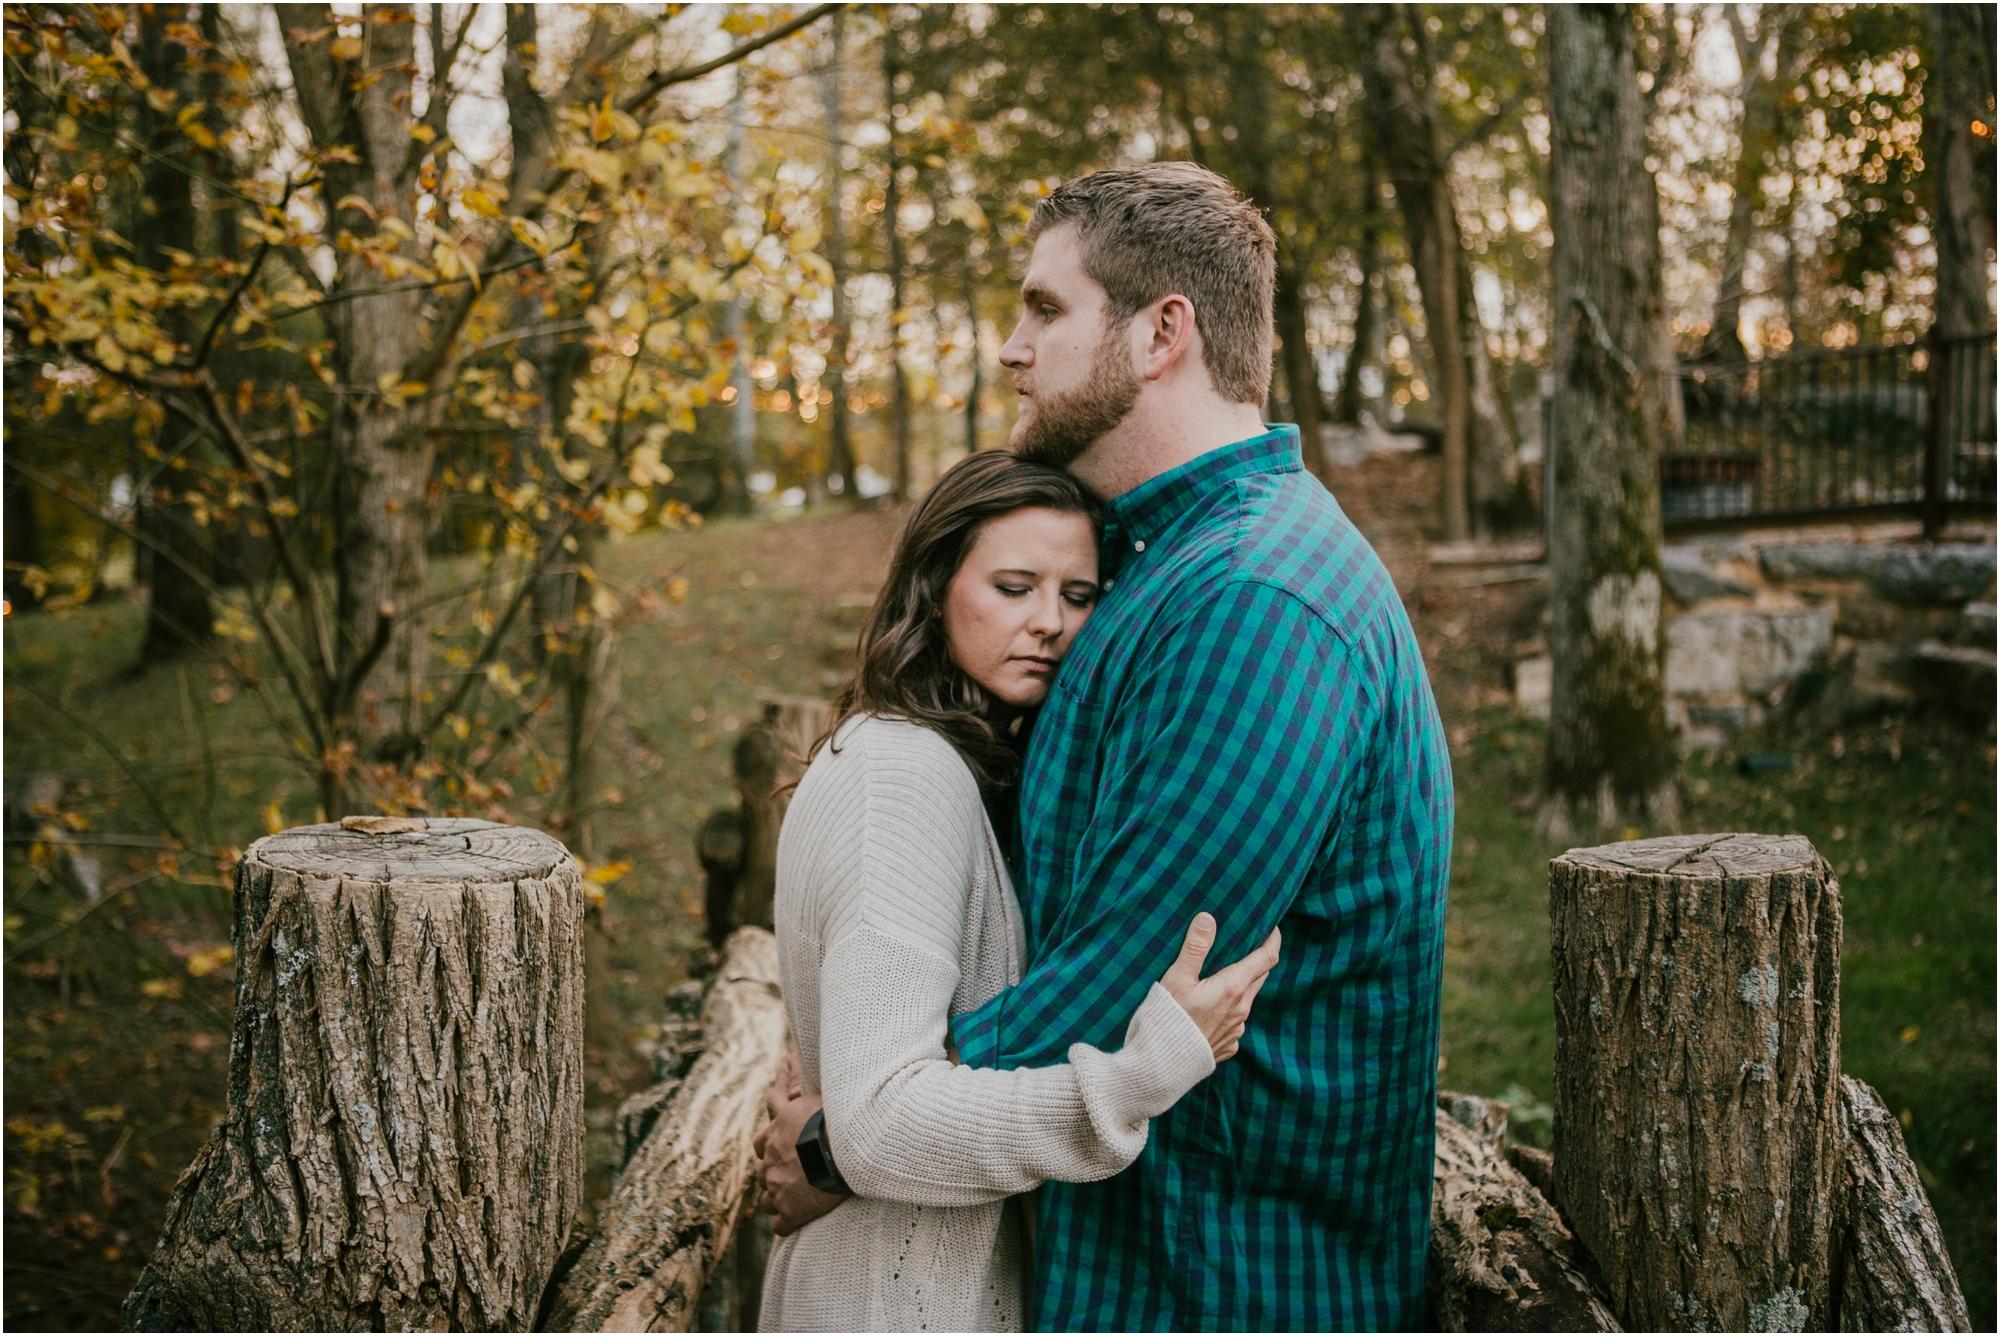 katy-sergent-millstone-limestone-tn-rustic-fall-engagement-session-adventurous-outdoors-intimate-elopement-wedding-northeast-johnson-city-photographer_0018.jpg